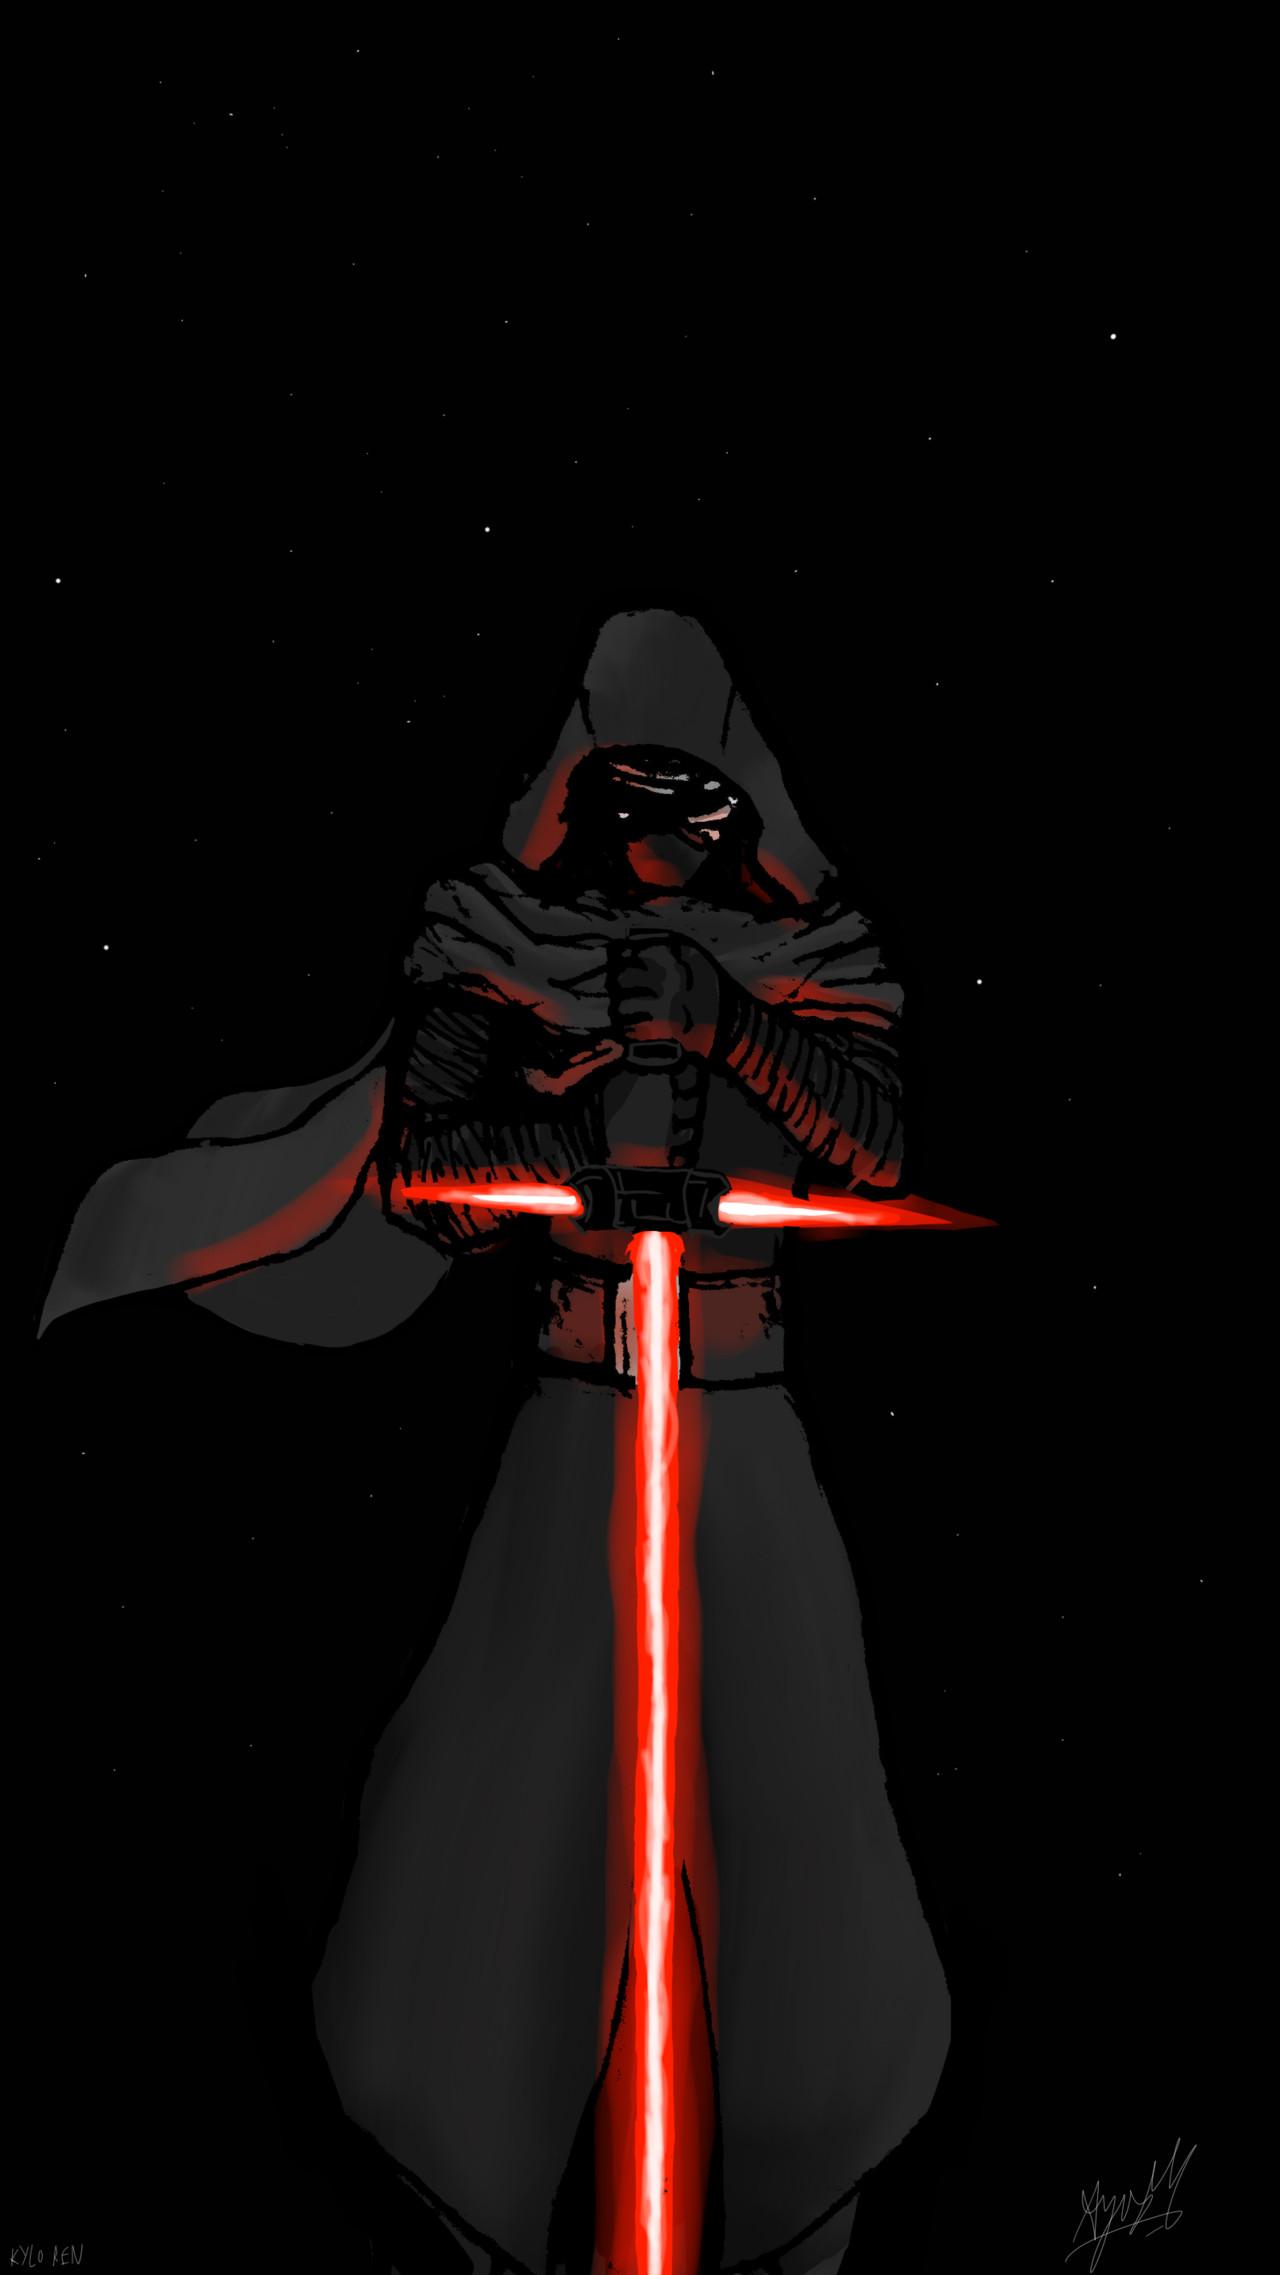 2048x1320 Star Wars Darth Vader Mask Anakin Skywalker Sith Wallpapers HD Desktop And Mobile Backgrounds